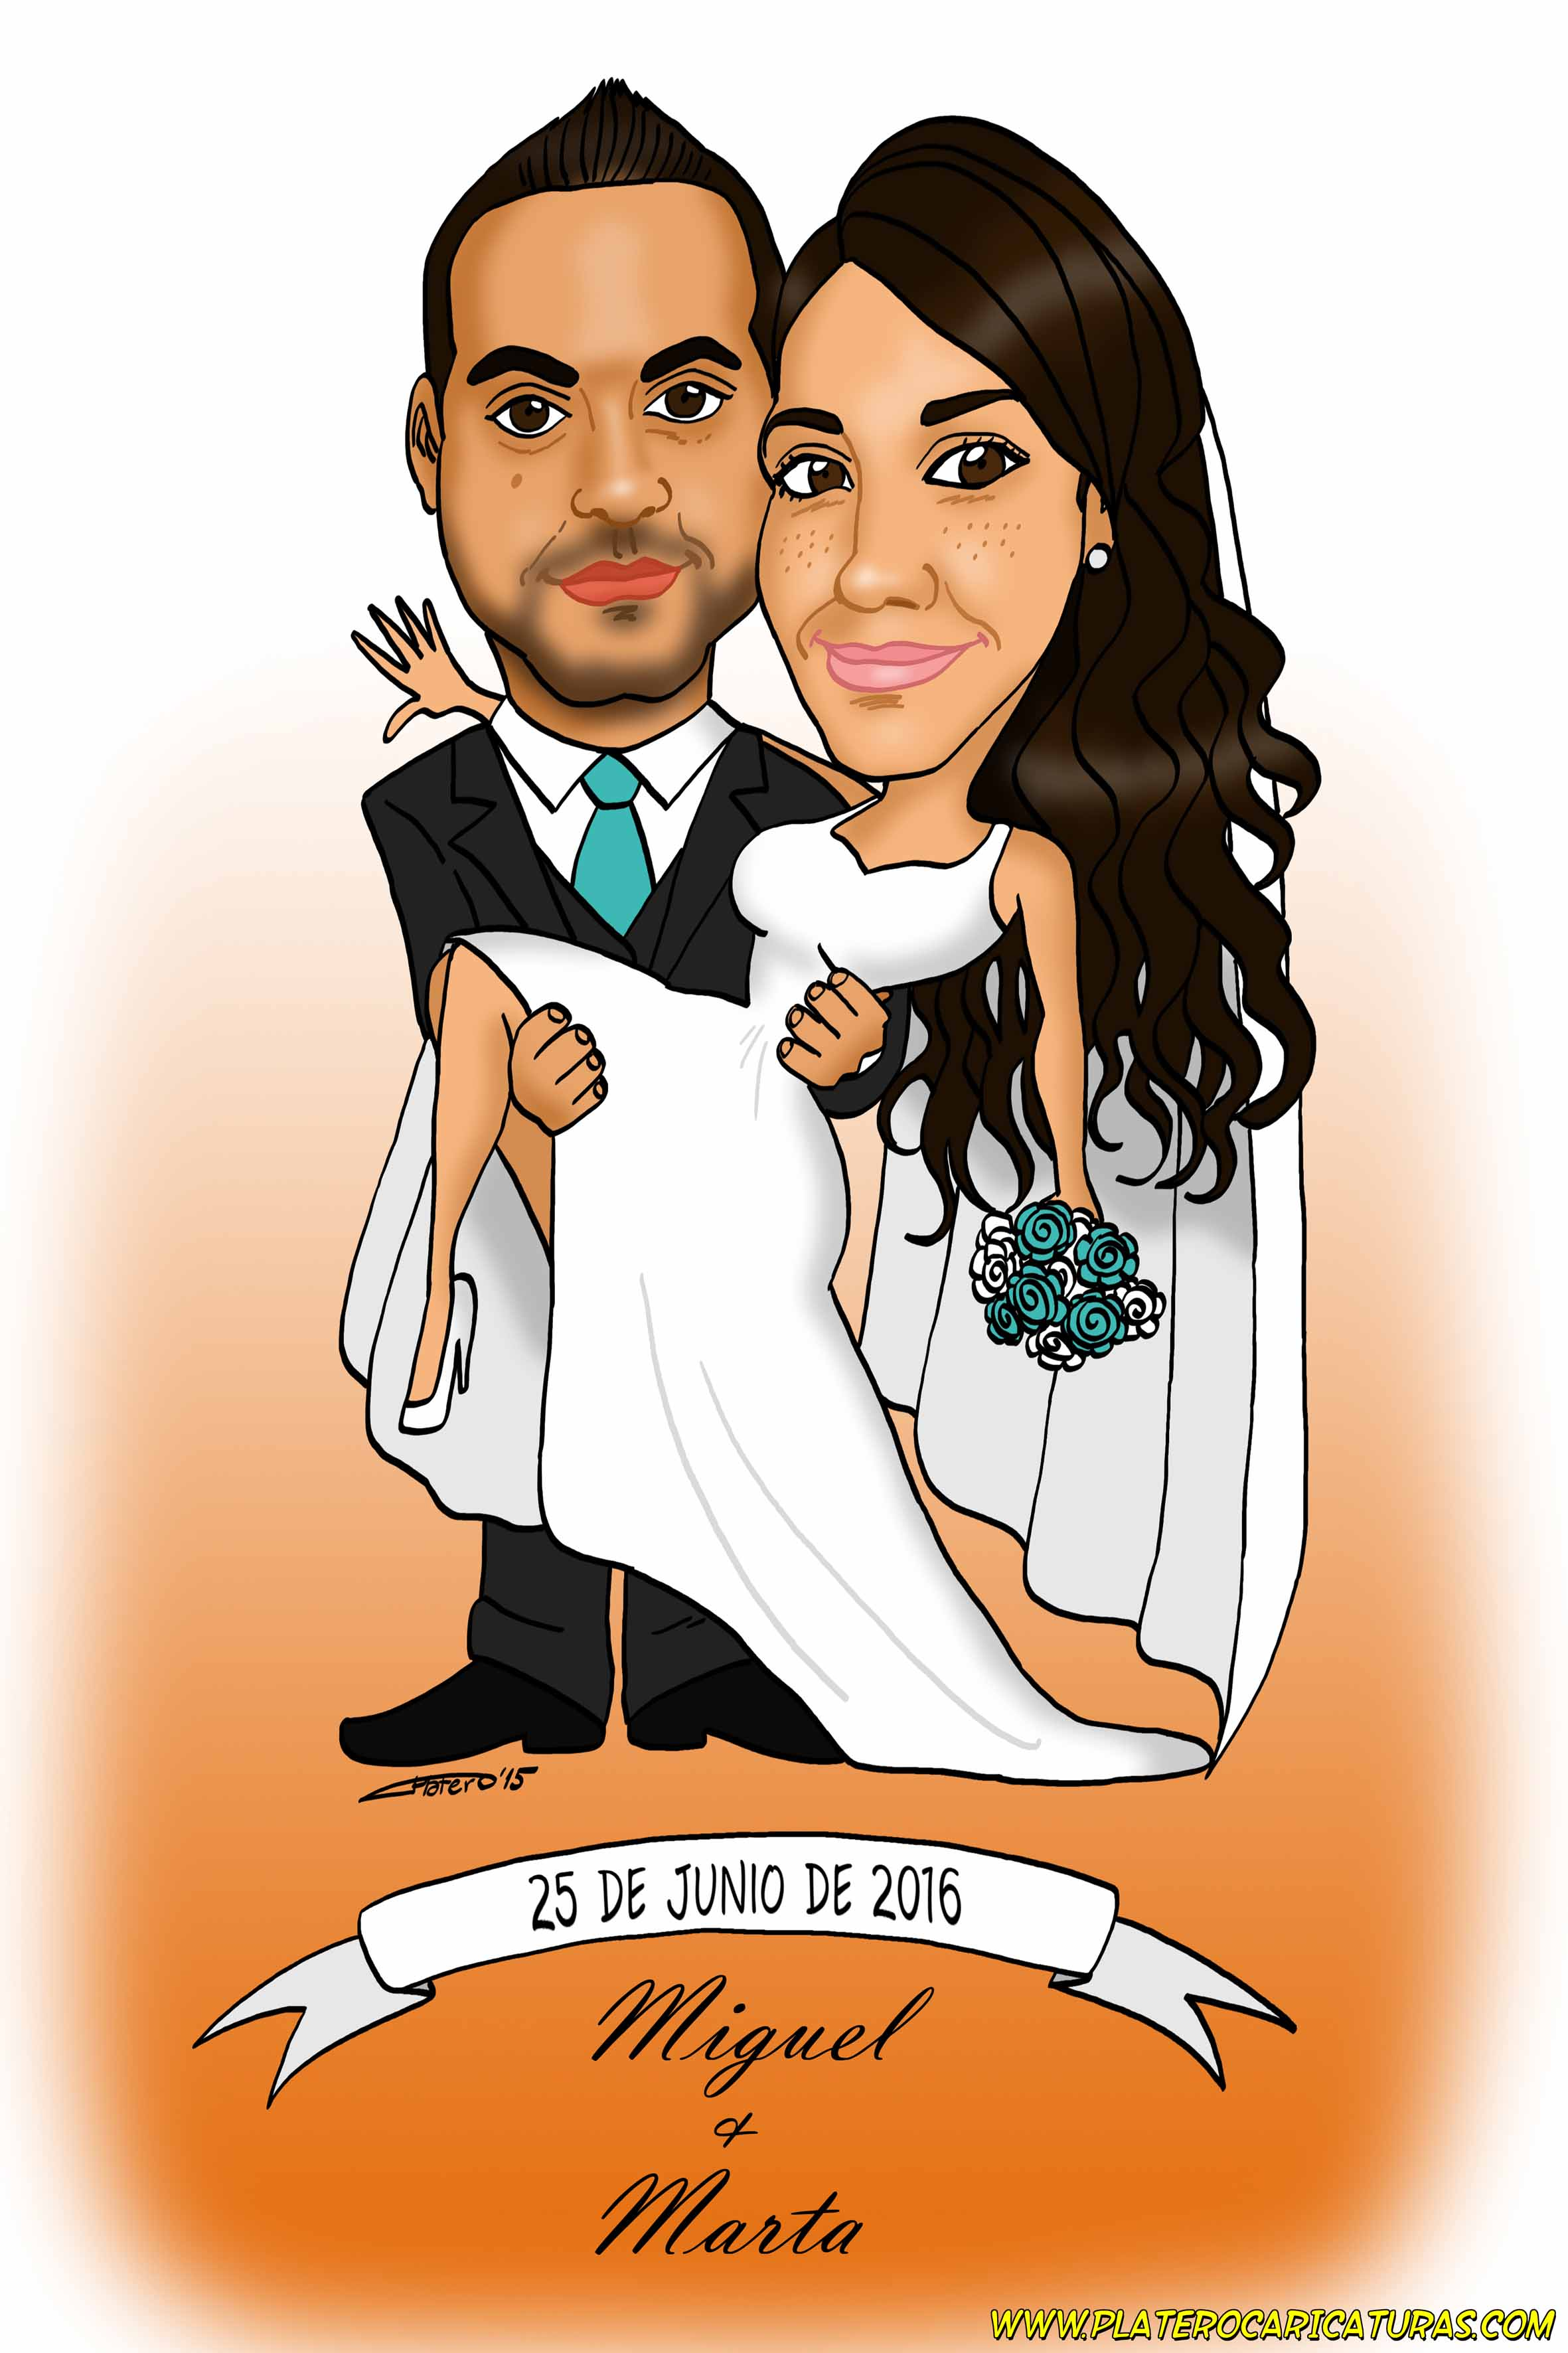 caricaturas_a_color_por_encargo_personalizadas_pareja_de_novios_tarjeta_boda_platerocaricaturas_elmu